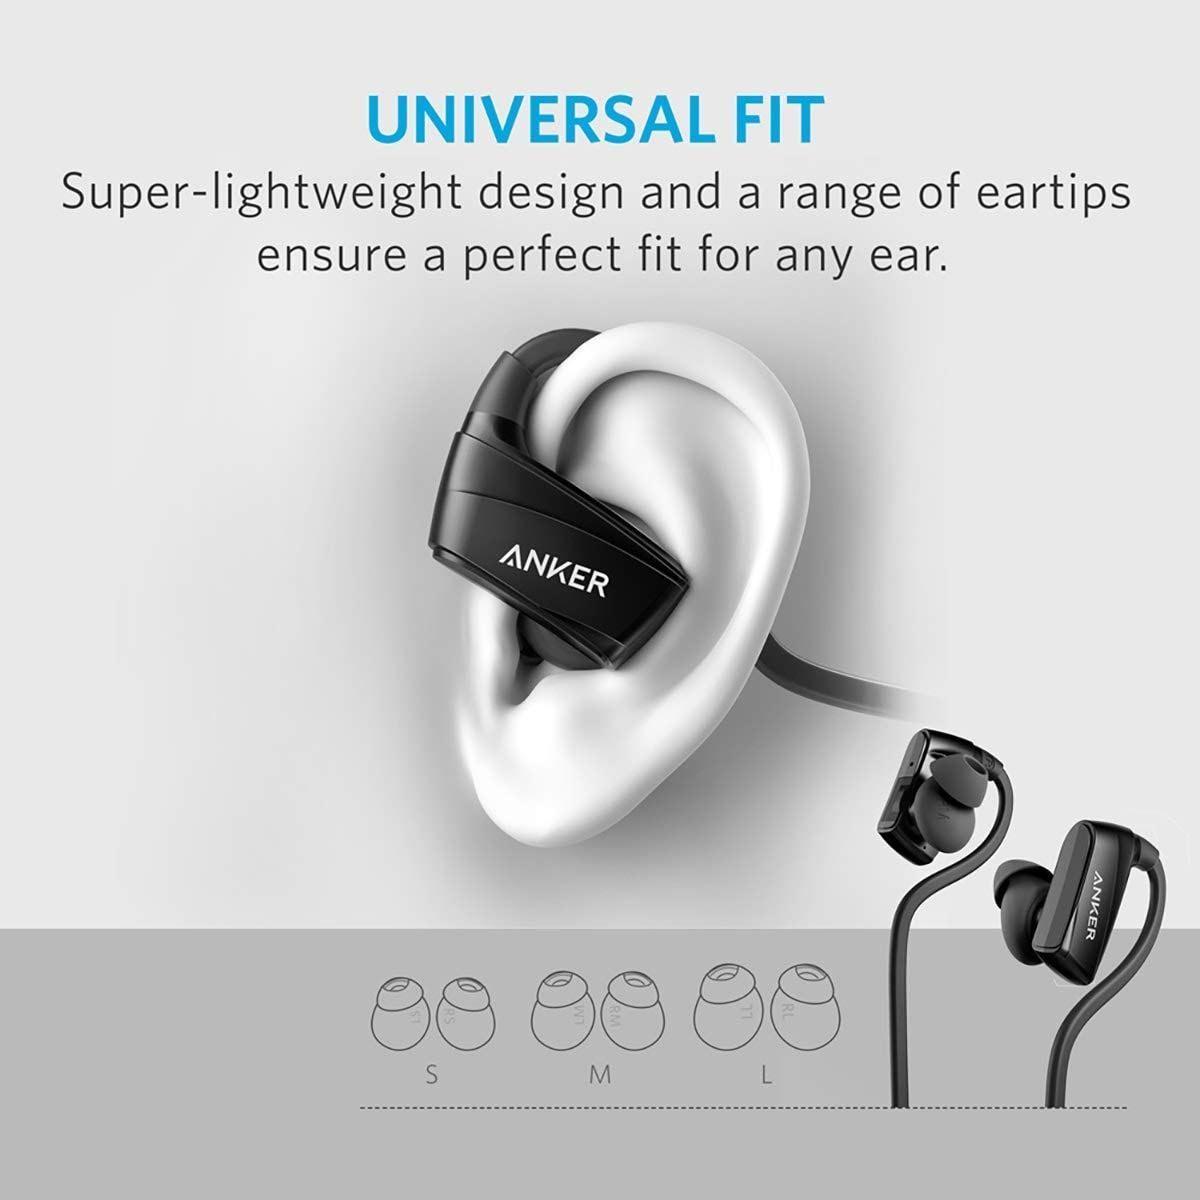 Best True Wireless Earbuds Under 100 Dollars